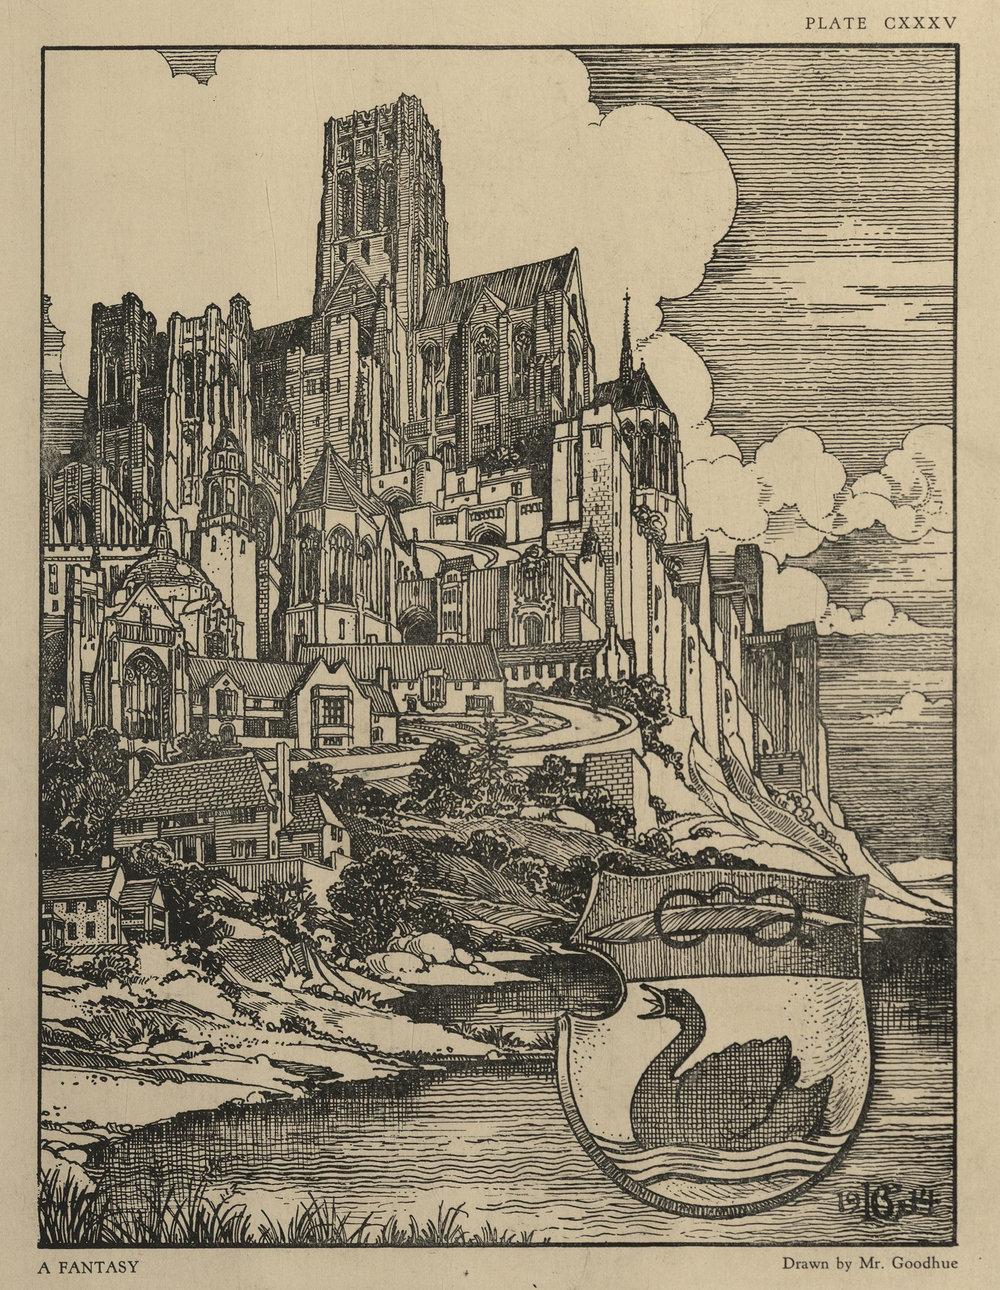 A Fantasy (1914)